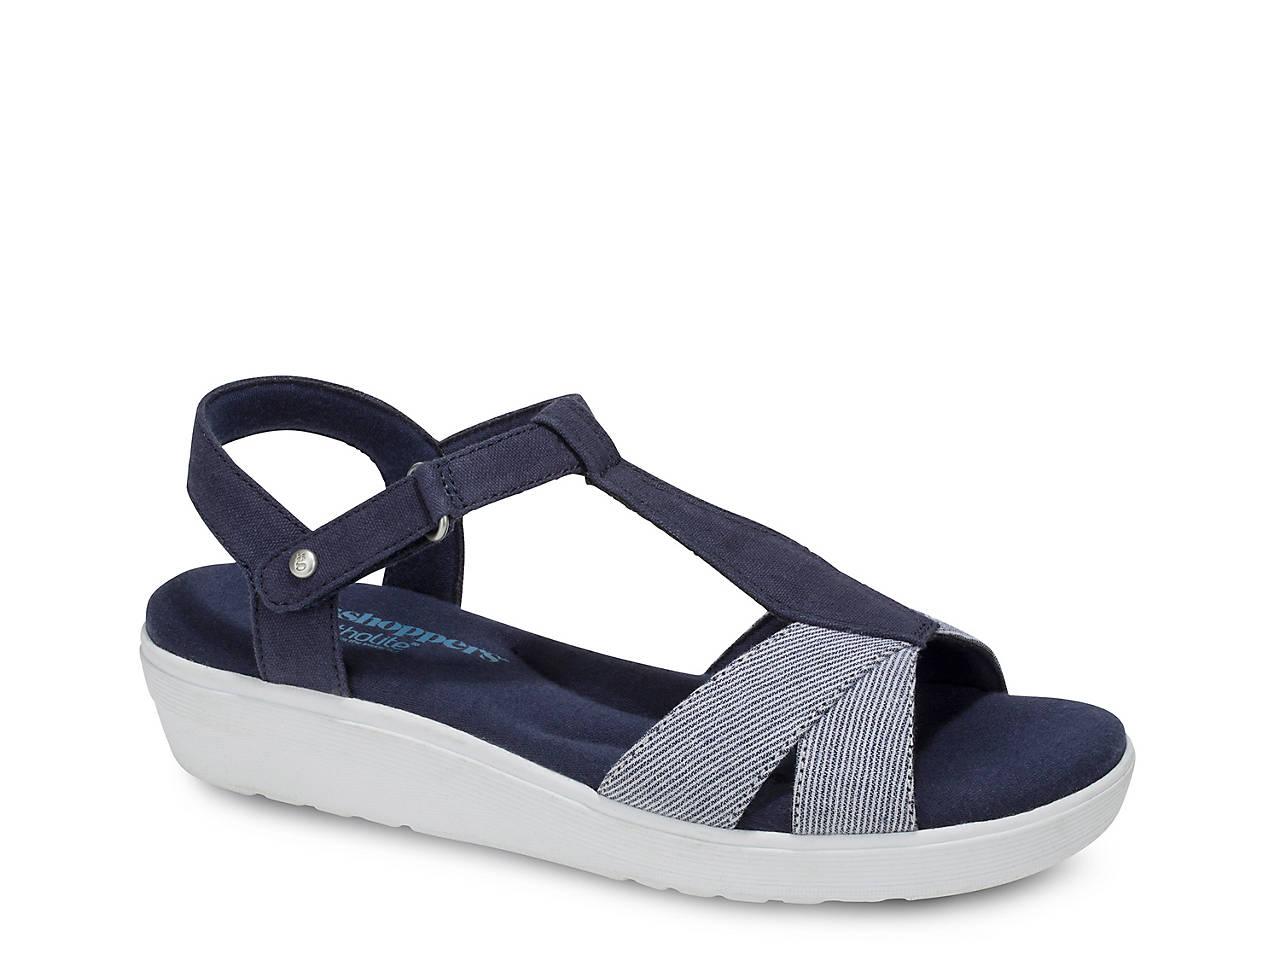 c2395c8da486 Grasshoppers Clover Wedge Sandal Women s Shoes